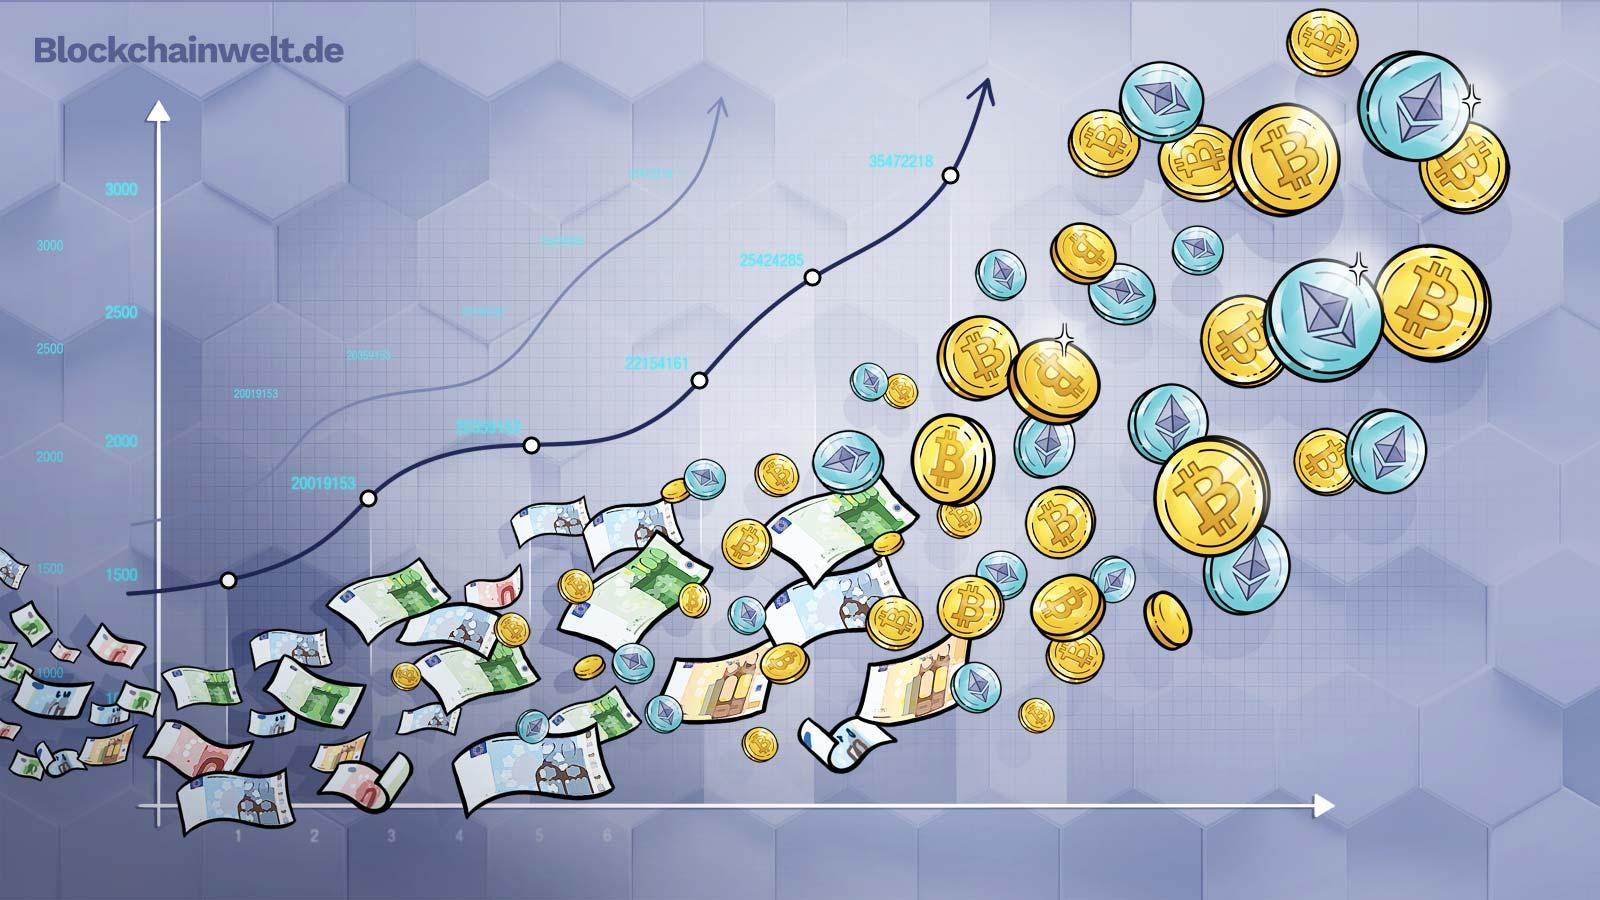 Bitcoin gold mining echtes geld verdienen?